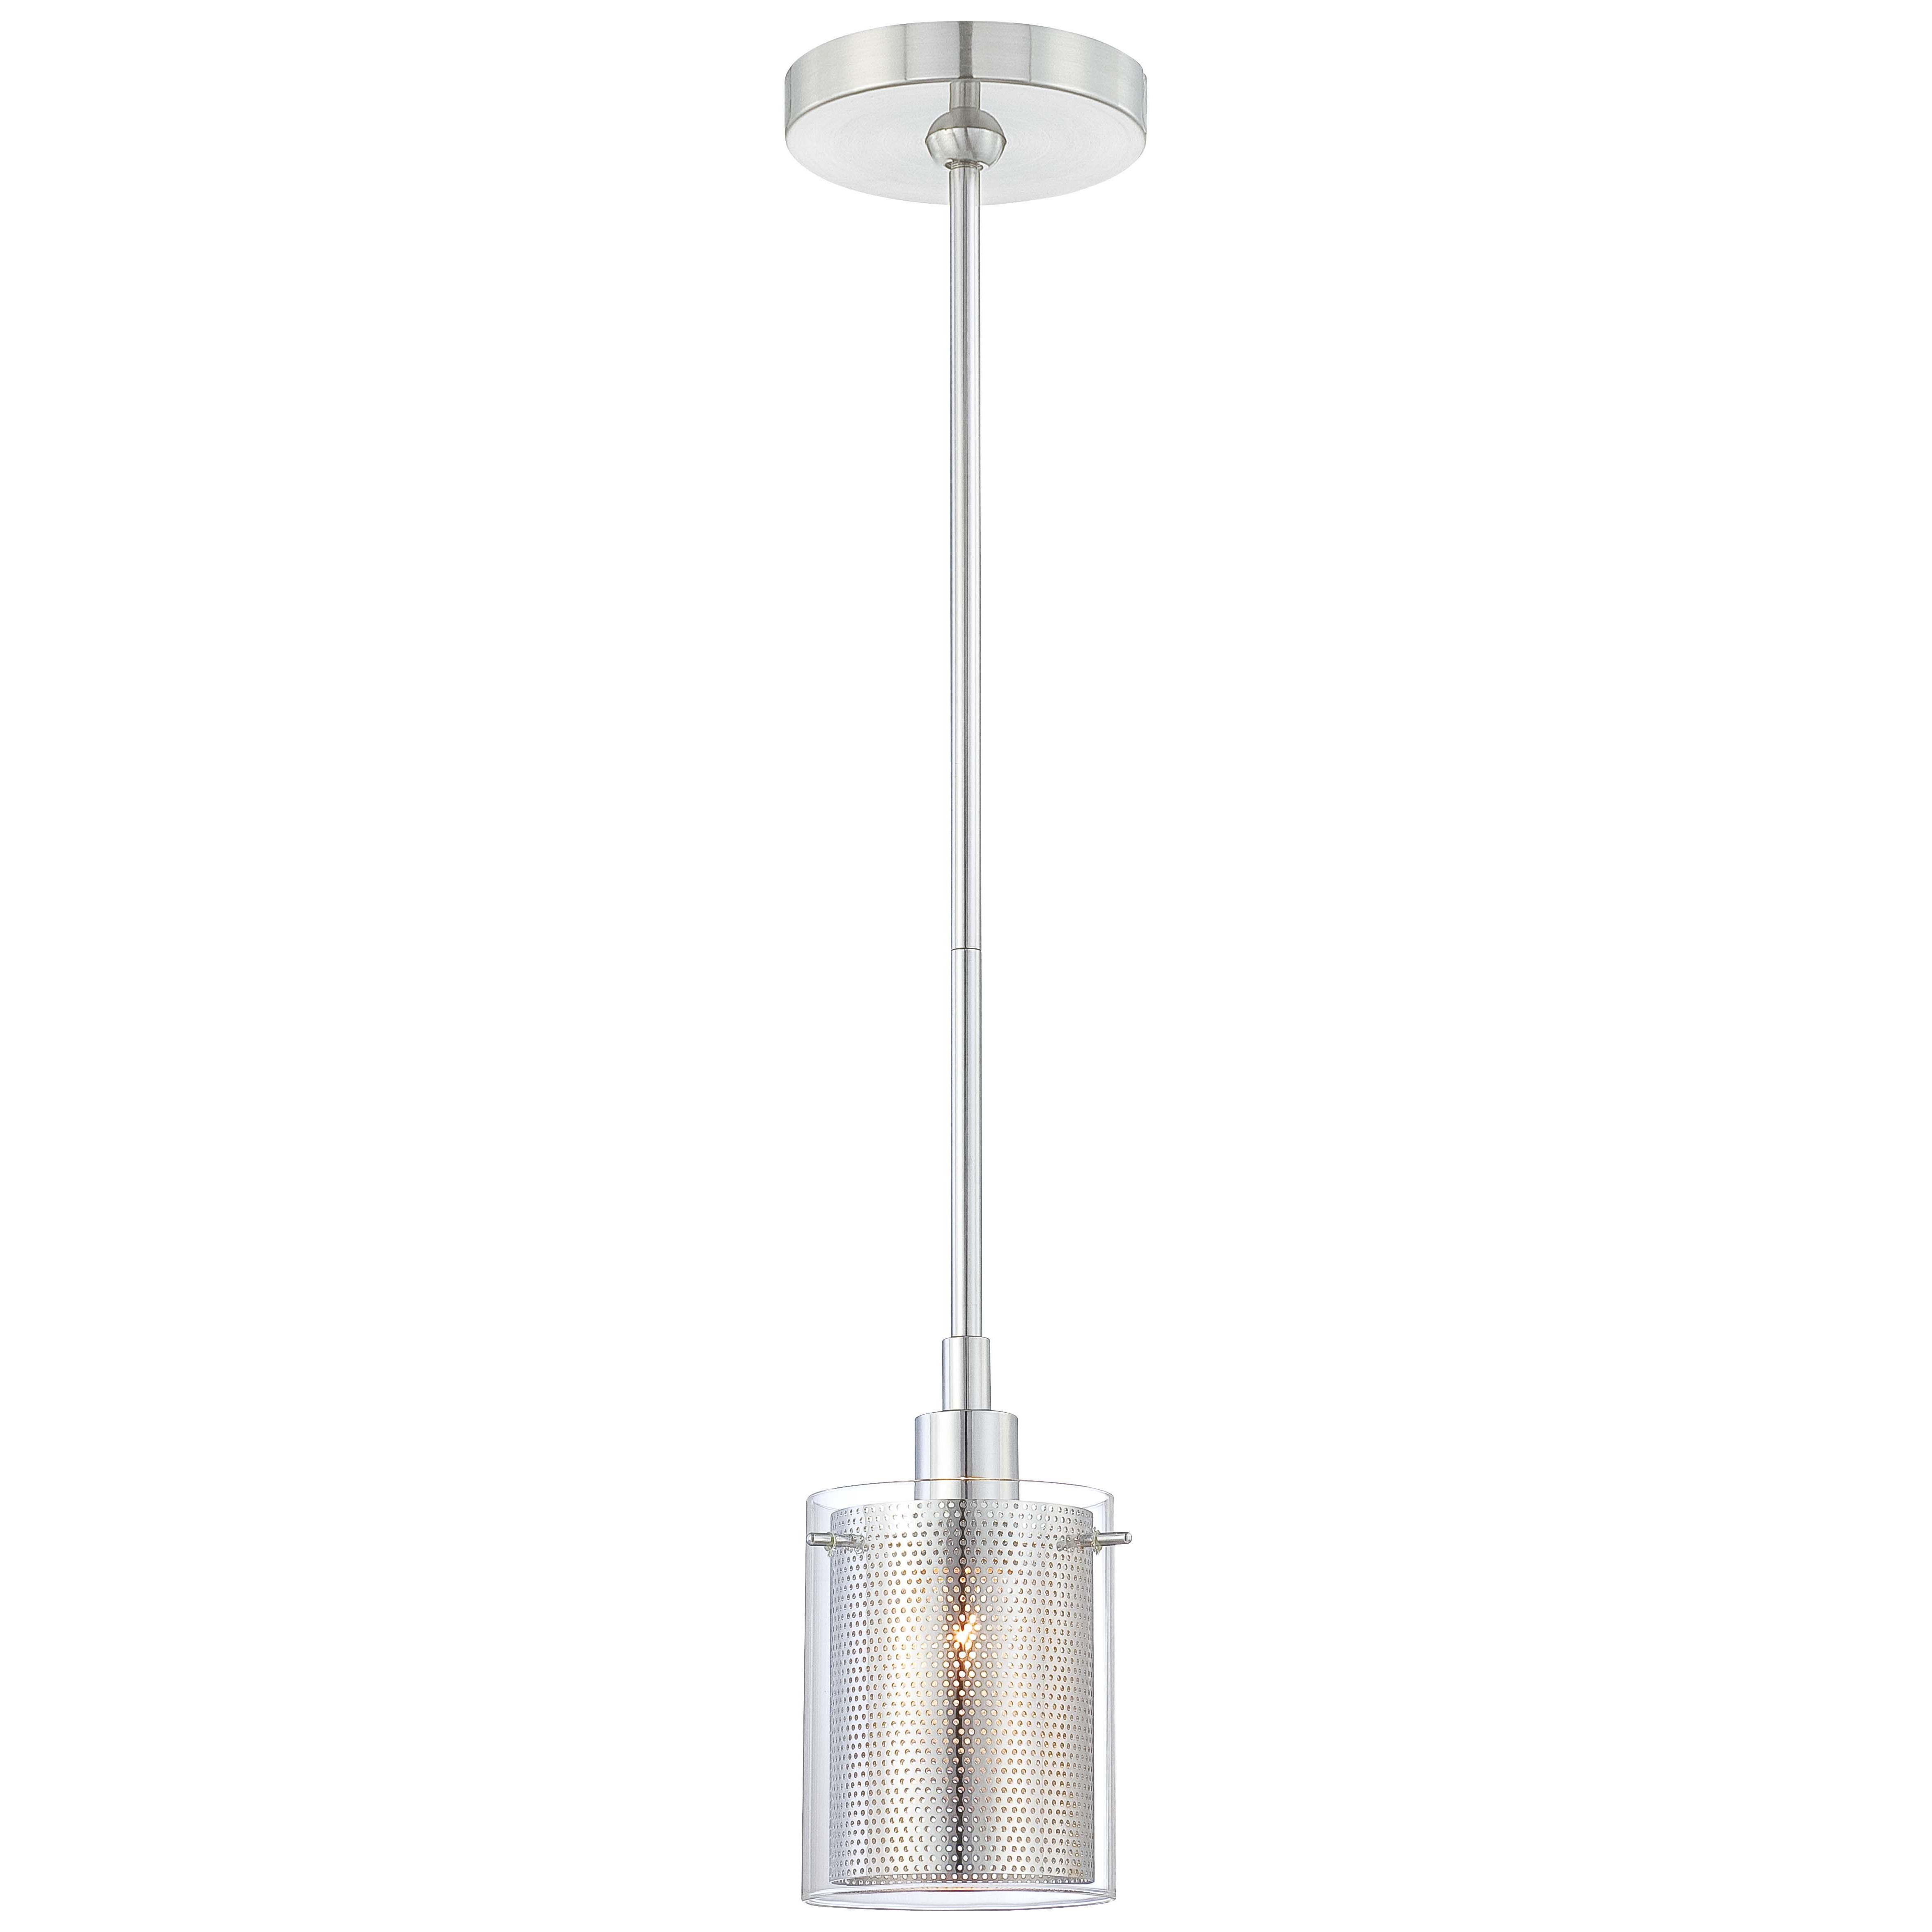 2020 Susan 1 Light Single Cylinder Pendant Pertaining To Angelina 1 Light Single Cylinder Pendants (View 3 of 20)